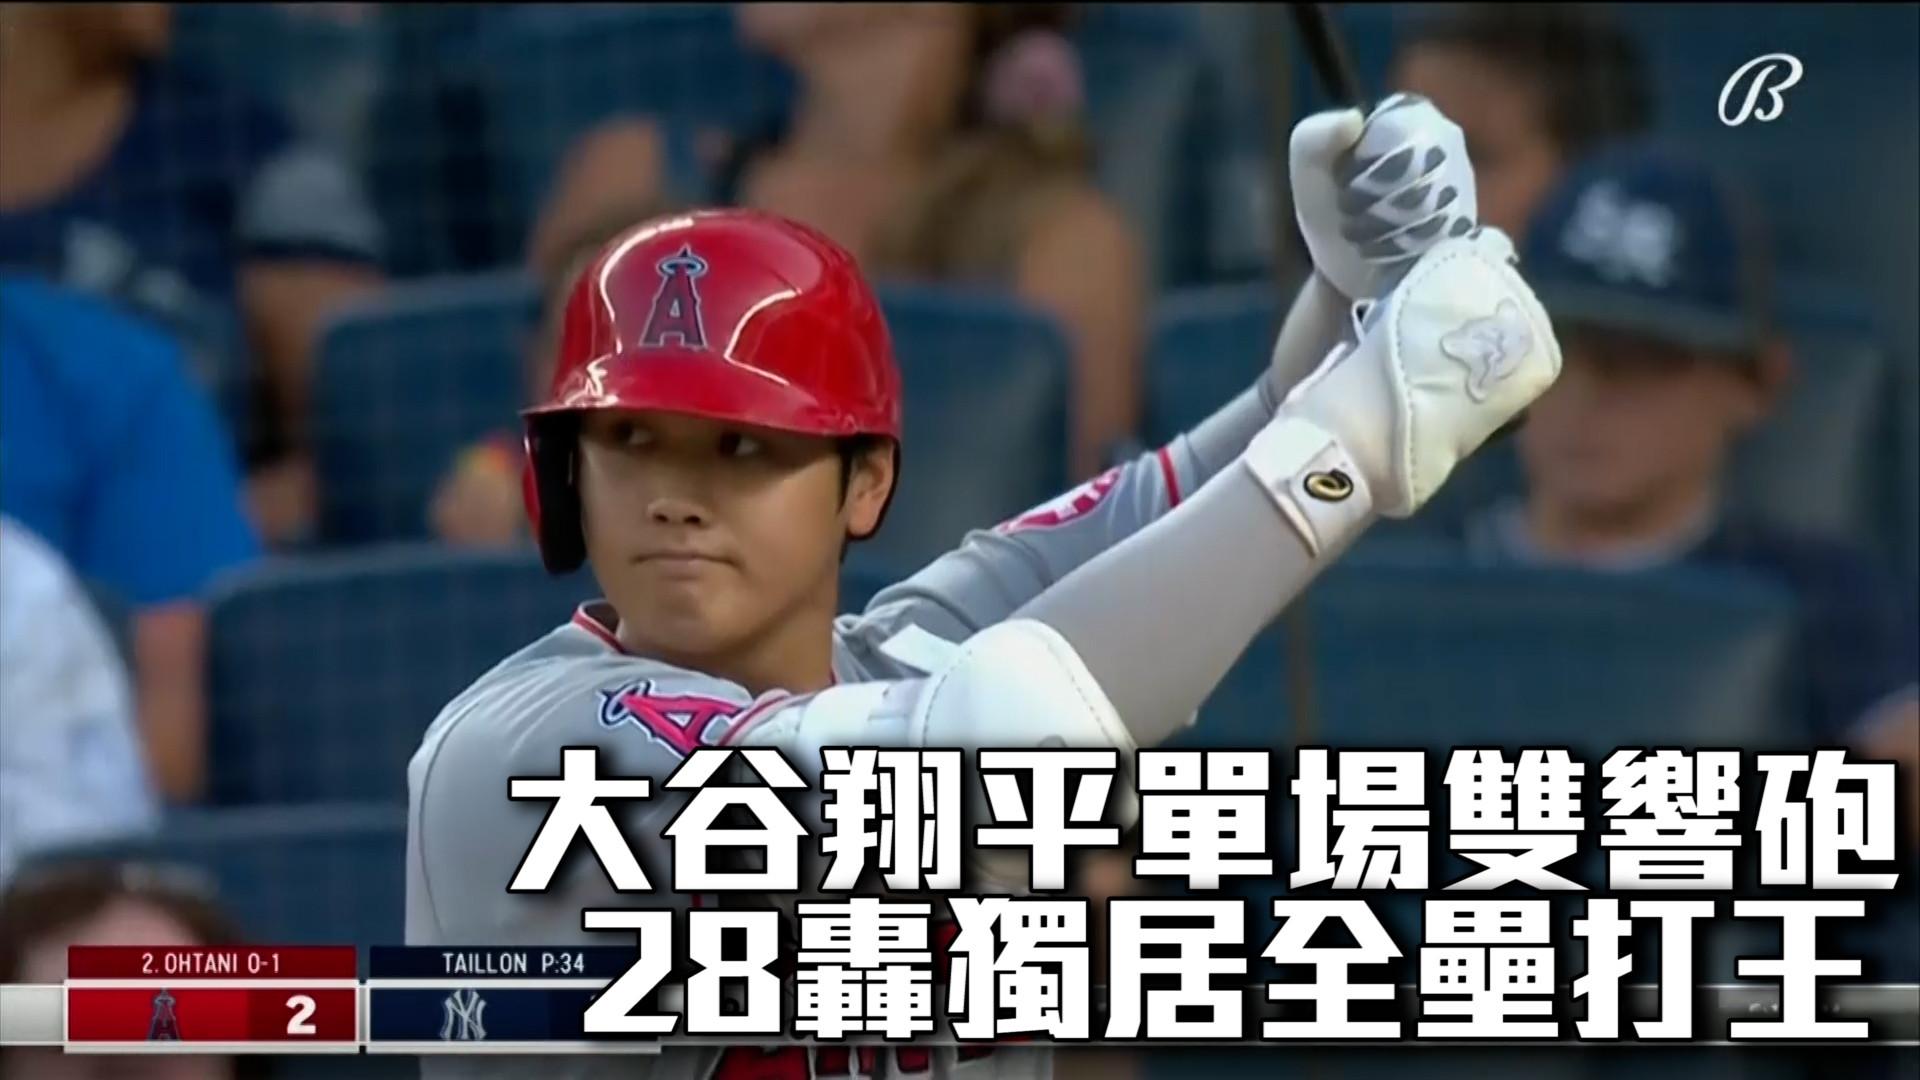 【MLB看愛爾達】大谷翔平單場雙響砲 獨居全壘打王 06/30